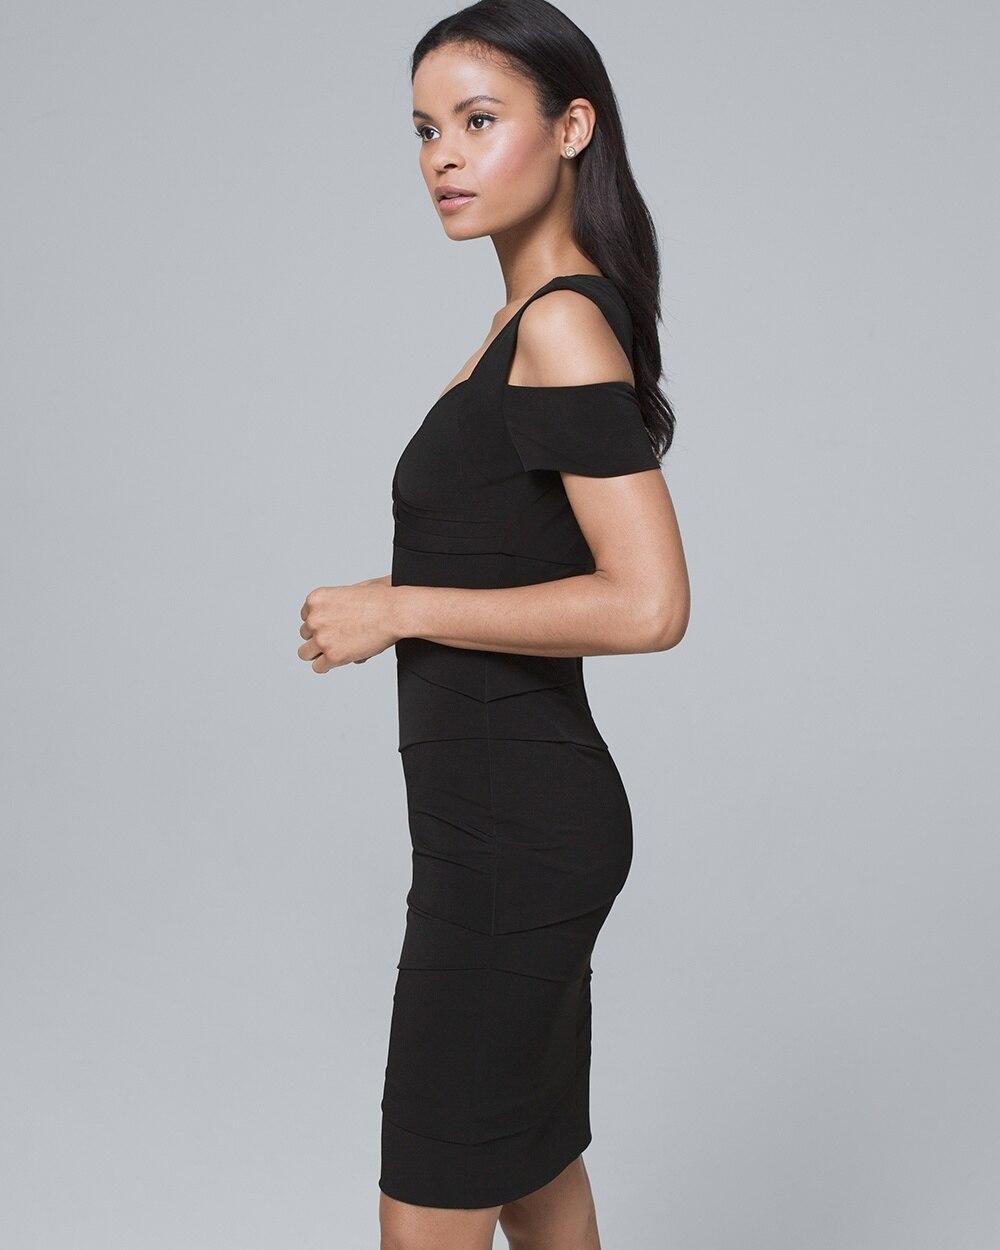 6bb840c239989 Return to thumbnail image selection Cold-Shoulder Black Instantly Slimming  Dress